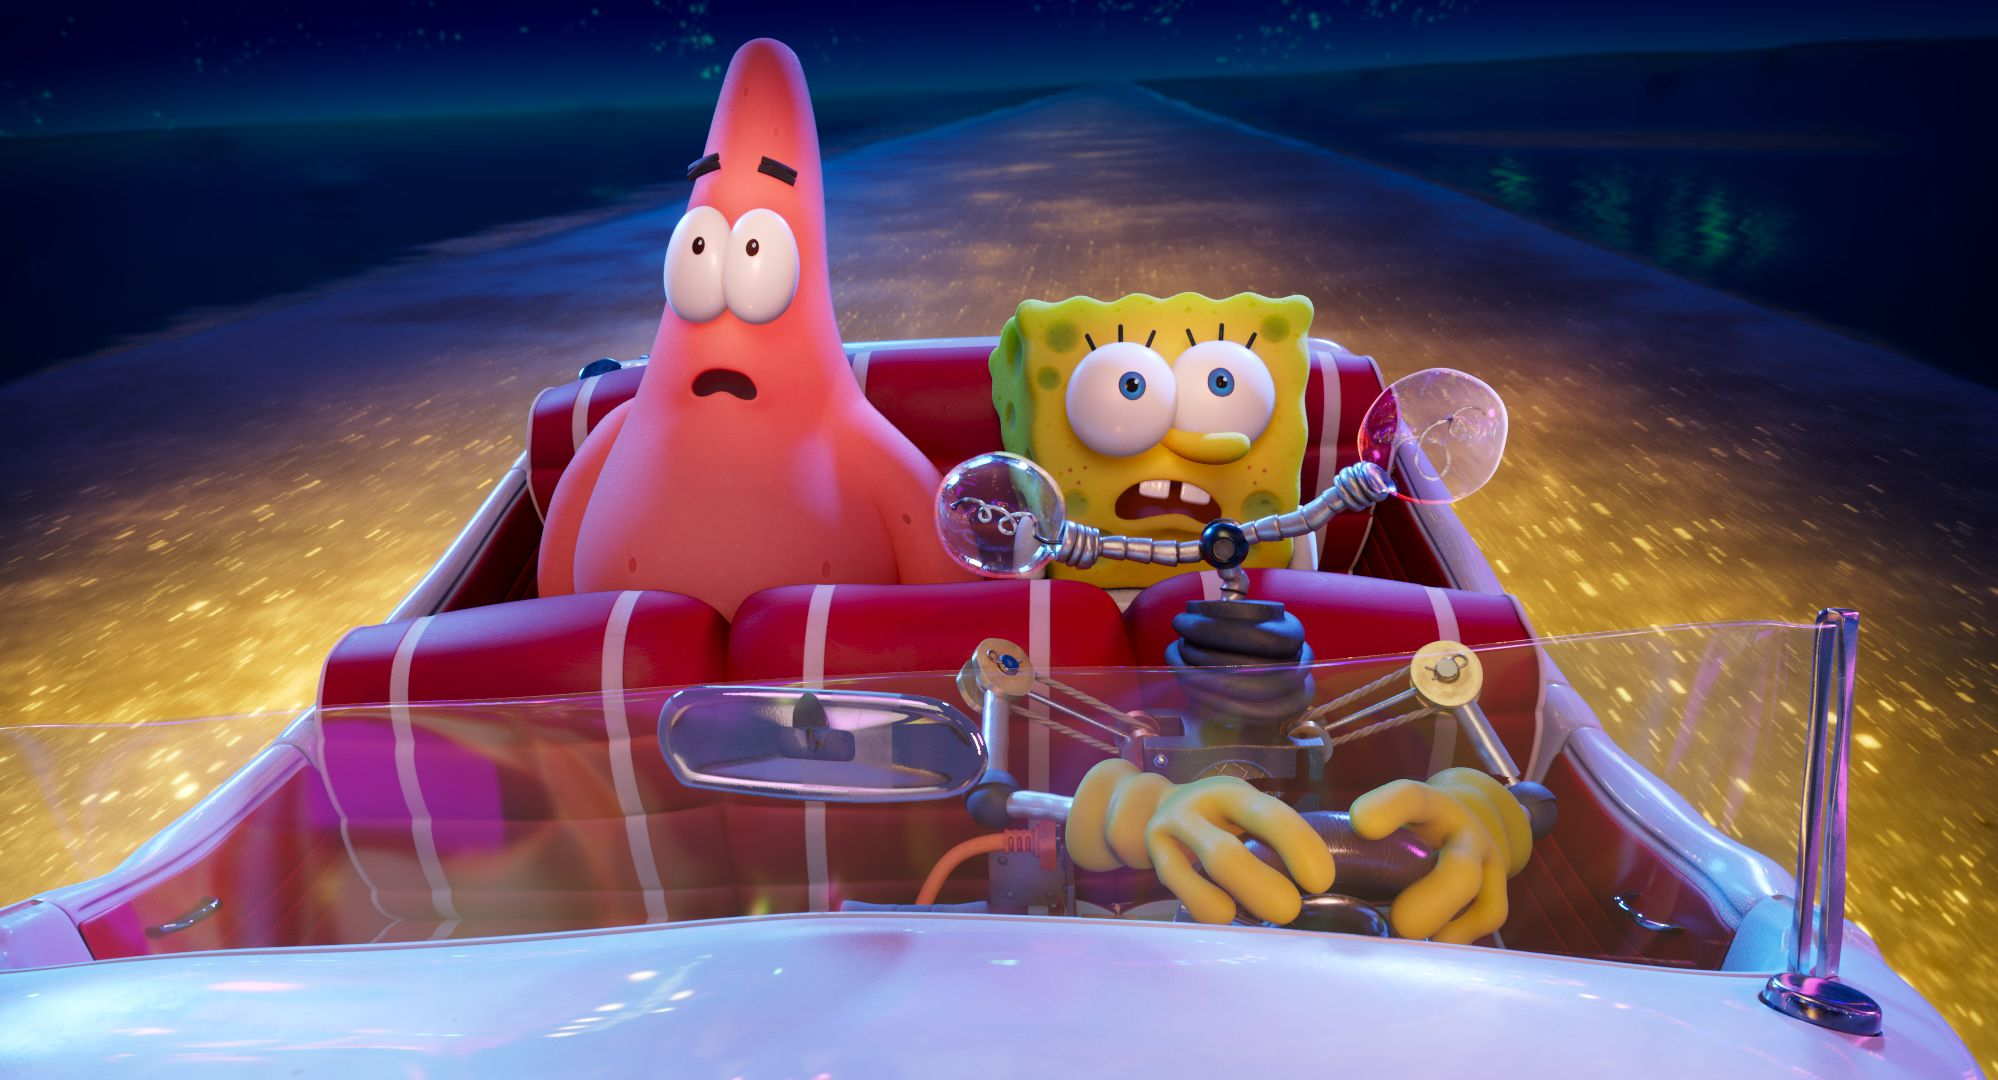 'The SpongeBob Movie: Sponge on the Run' courtesy Paramount Animation